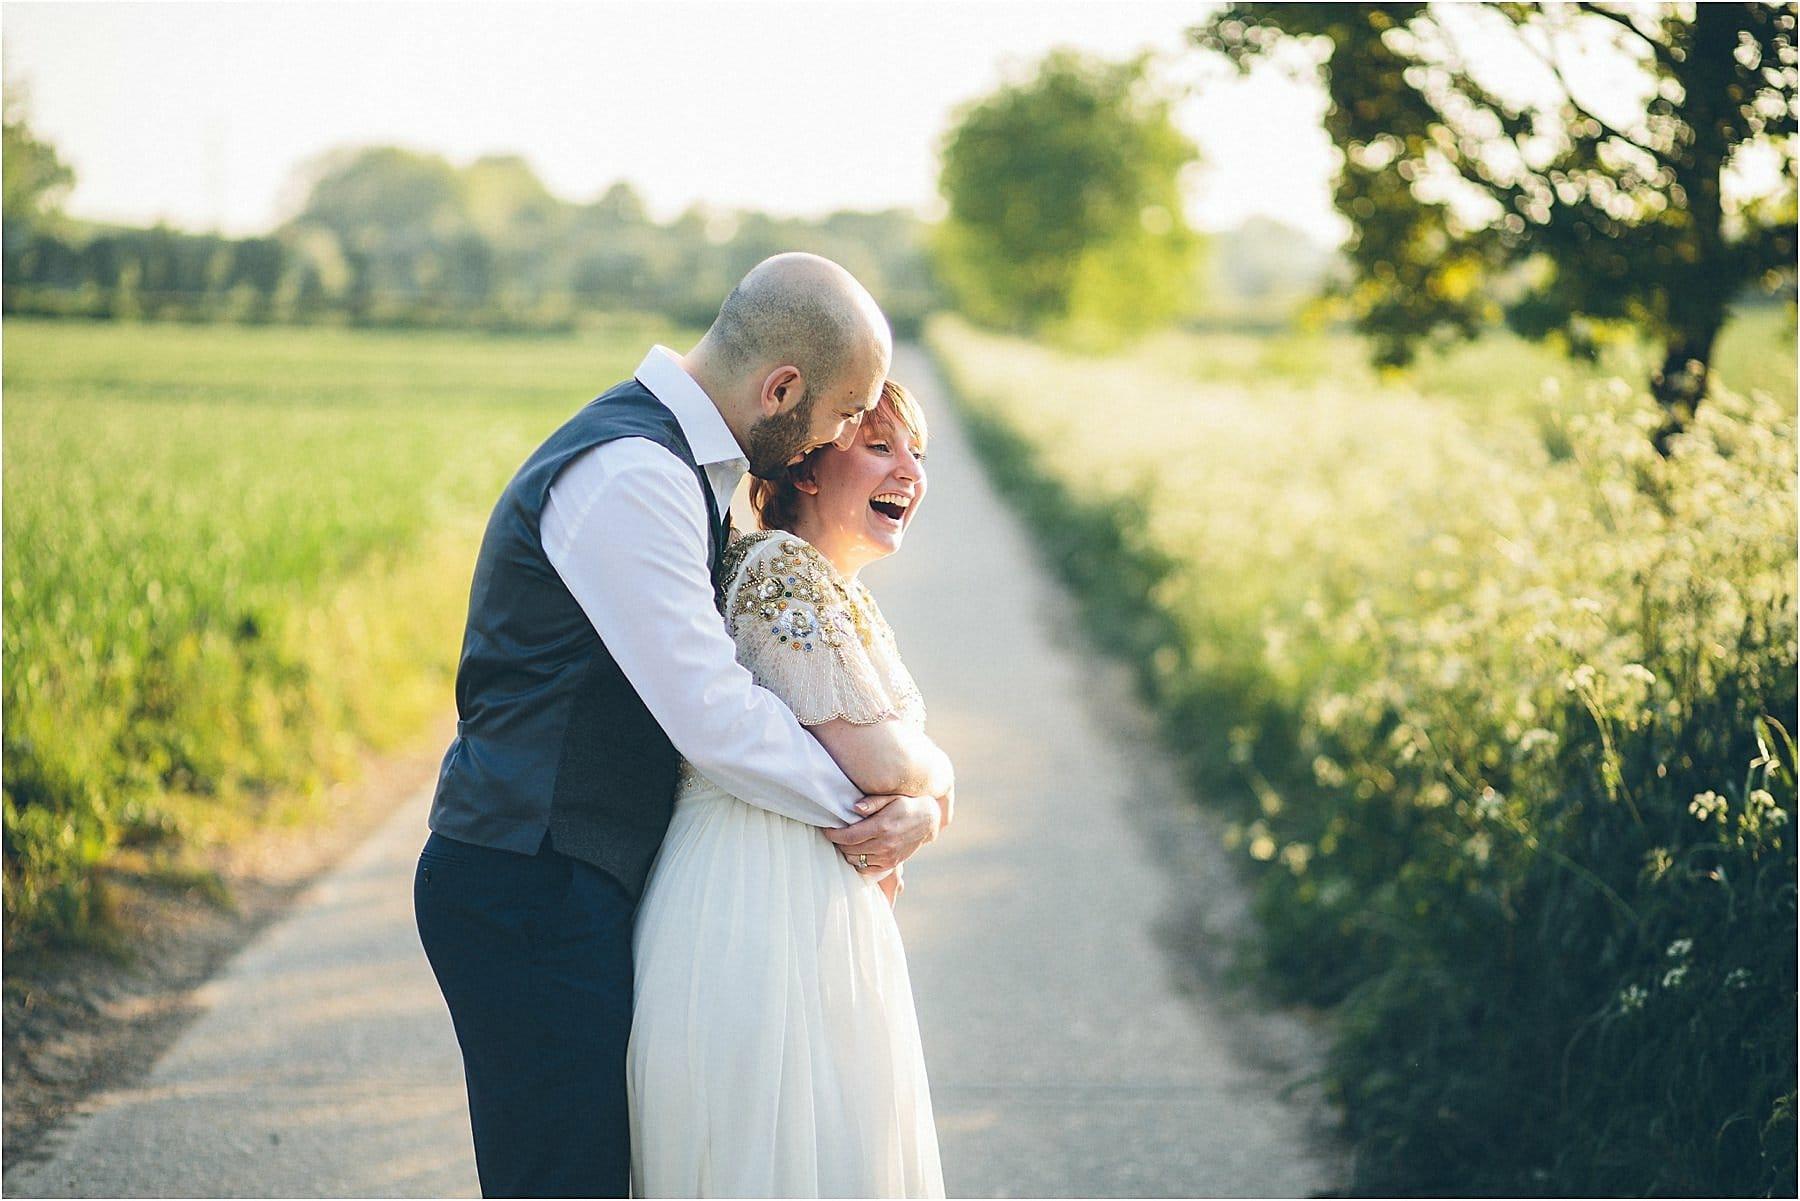 The_Barn_At_Bury_Court_Wedding_101